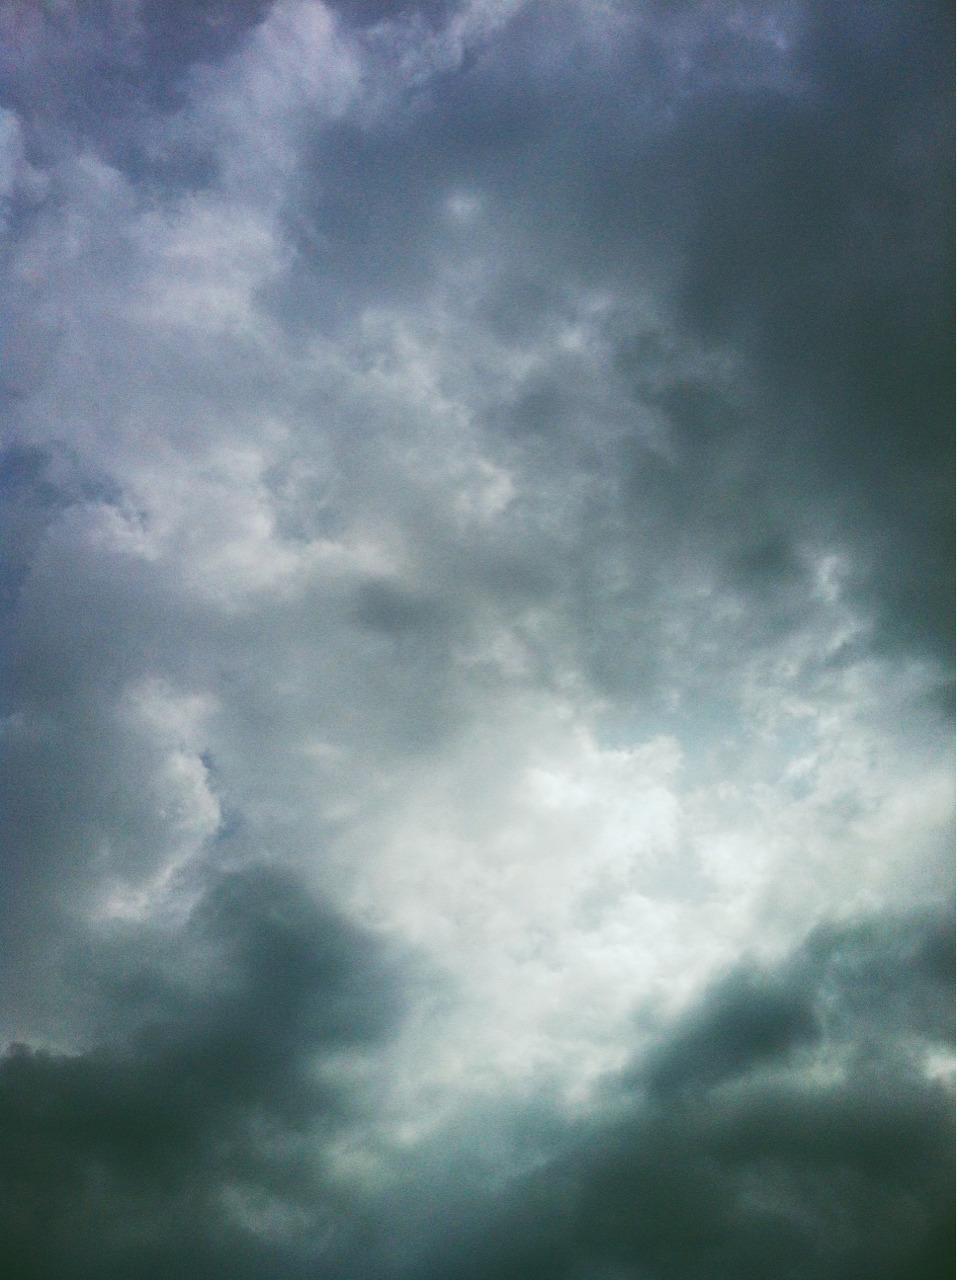 #rainy #cloudy #sun #emerging #skies